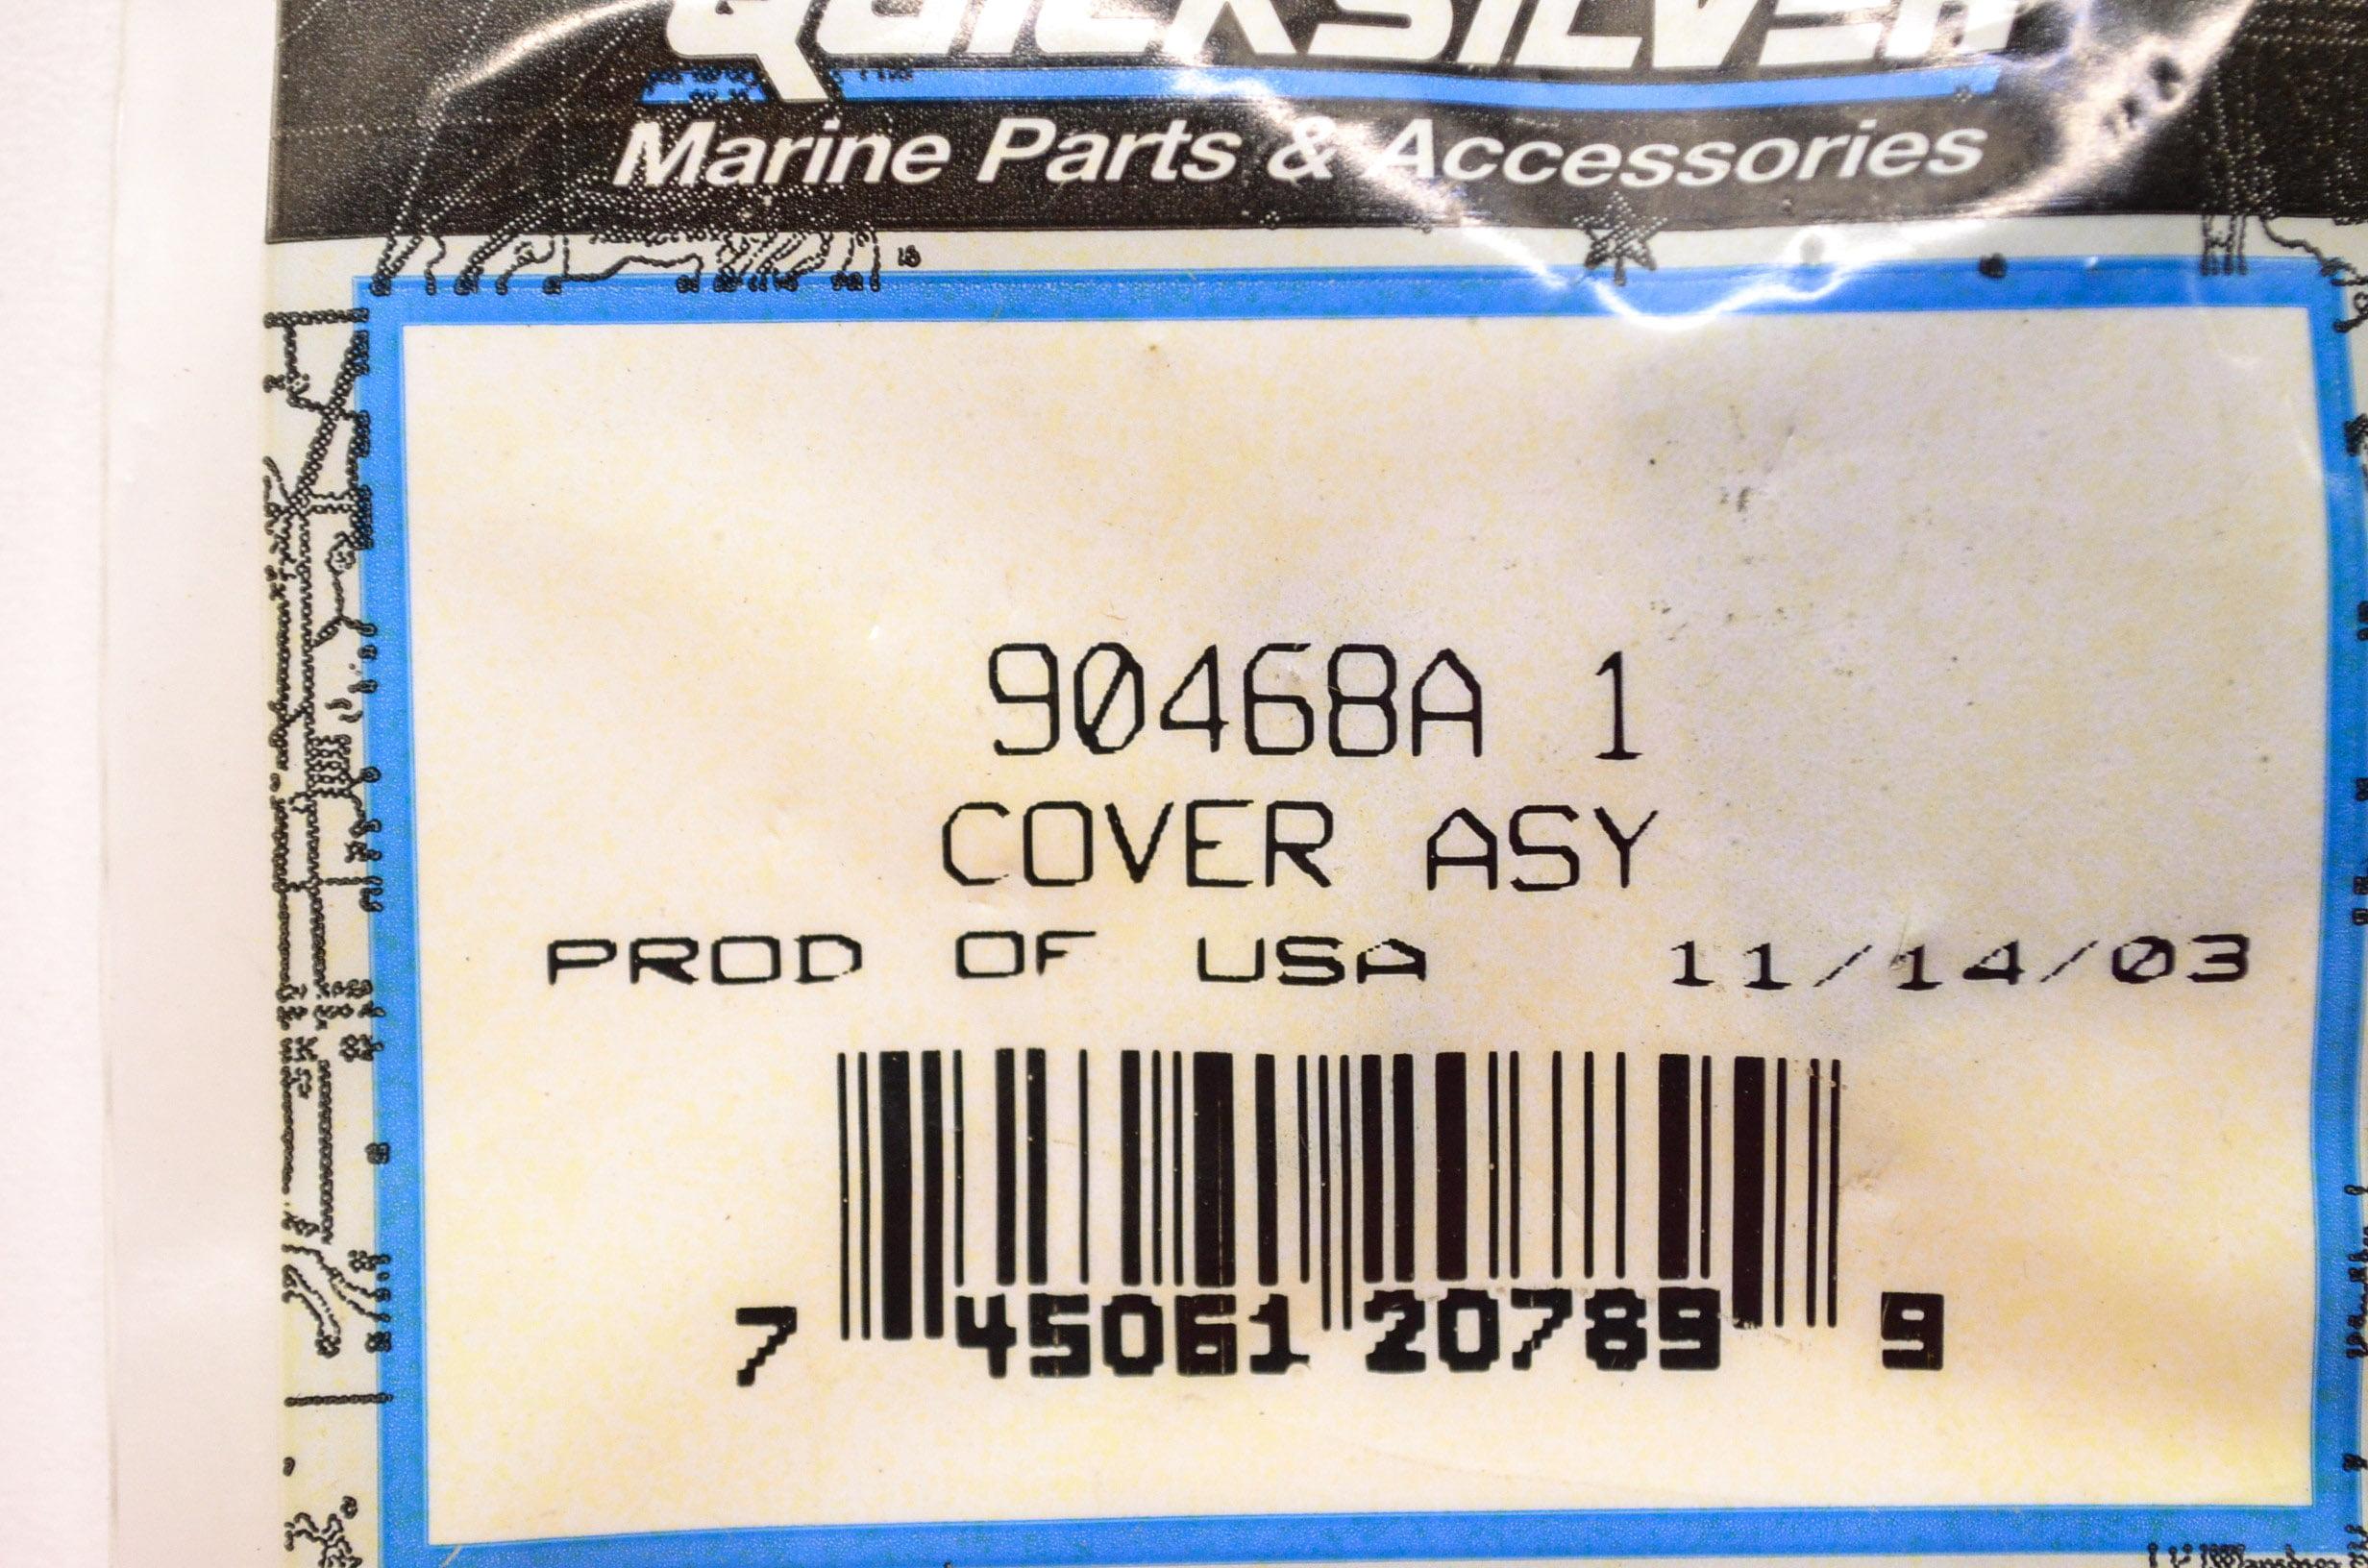 New Mercury Mercruiser Quicksilver Oem Part # 90468A 1 Cover Assy